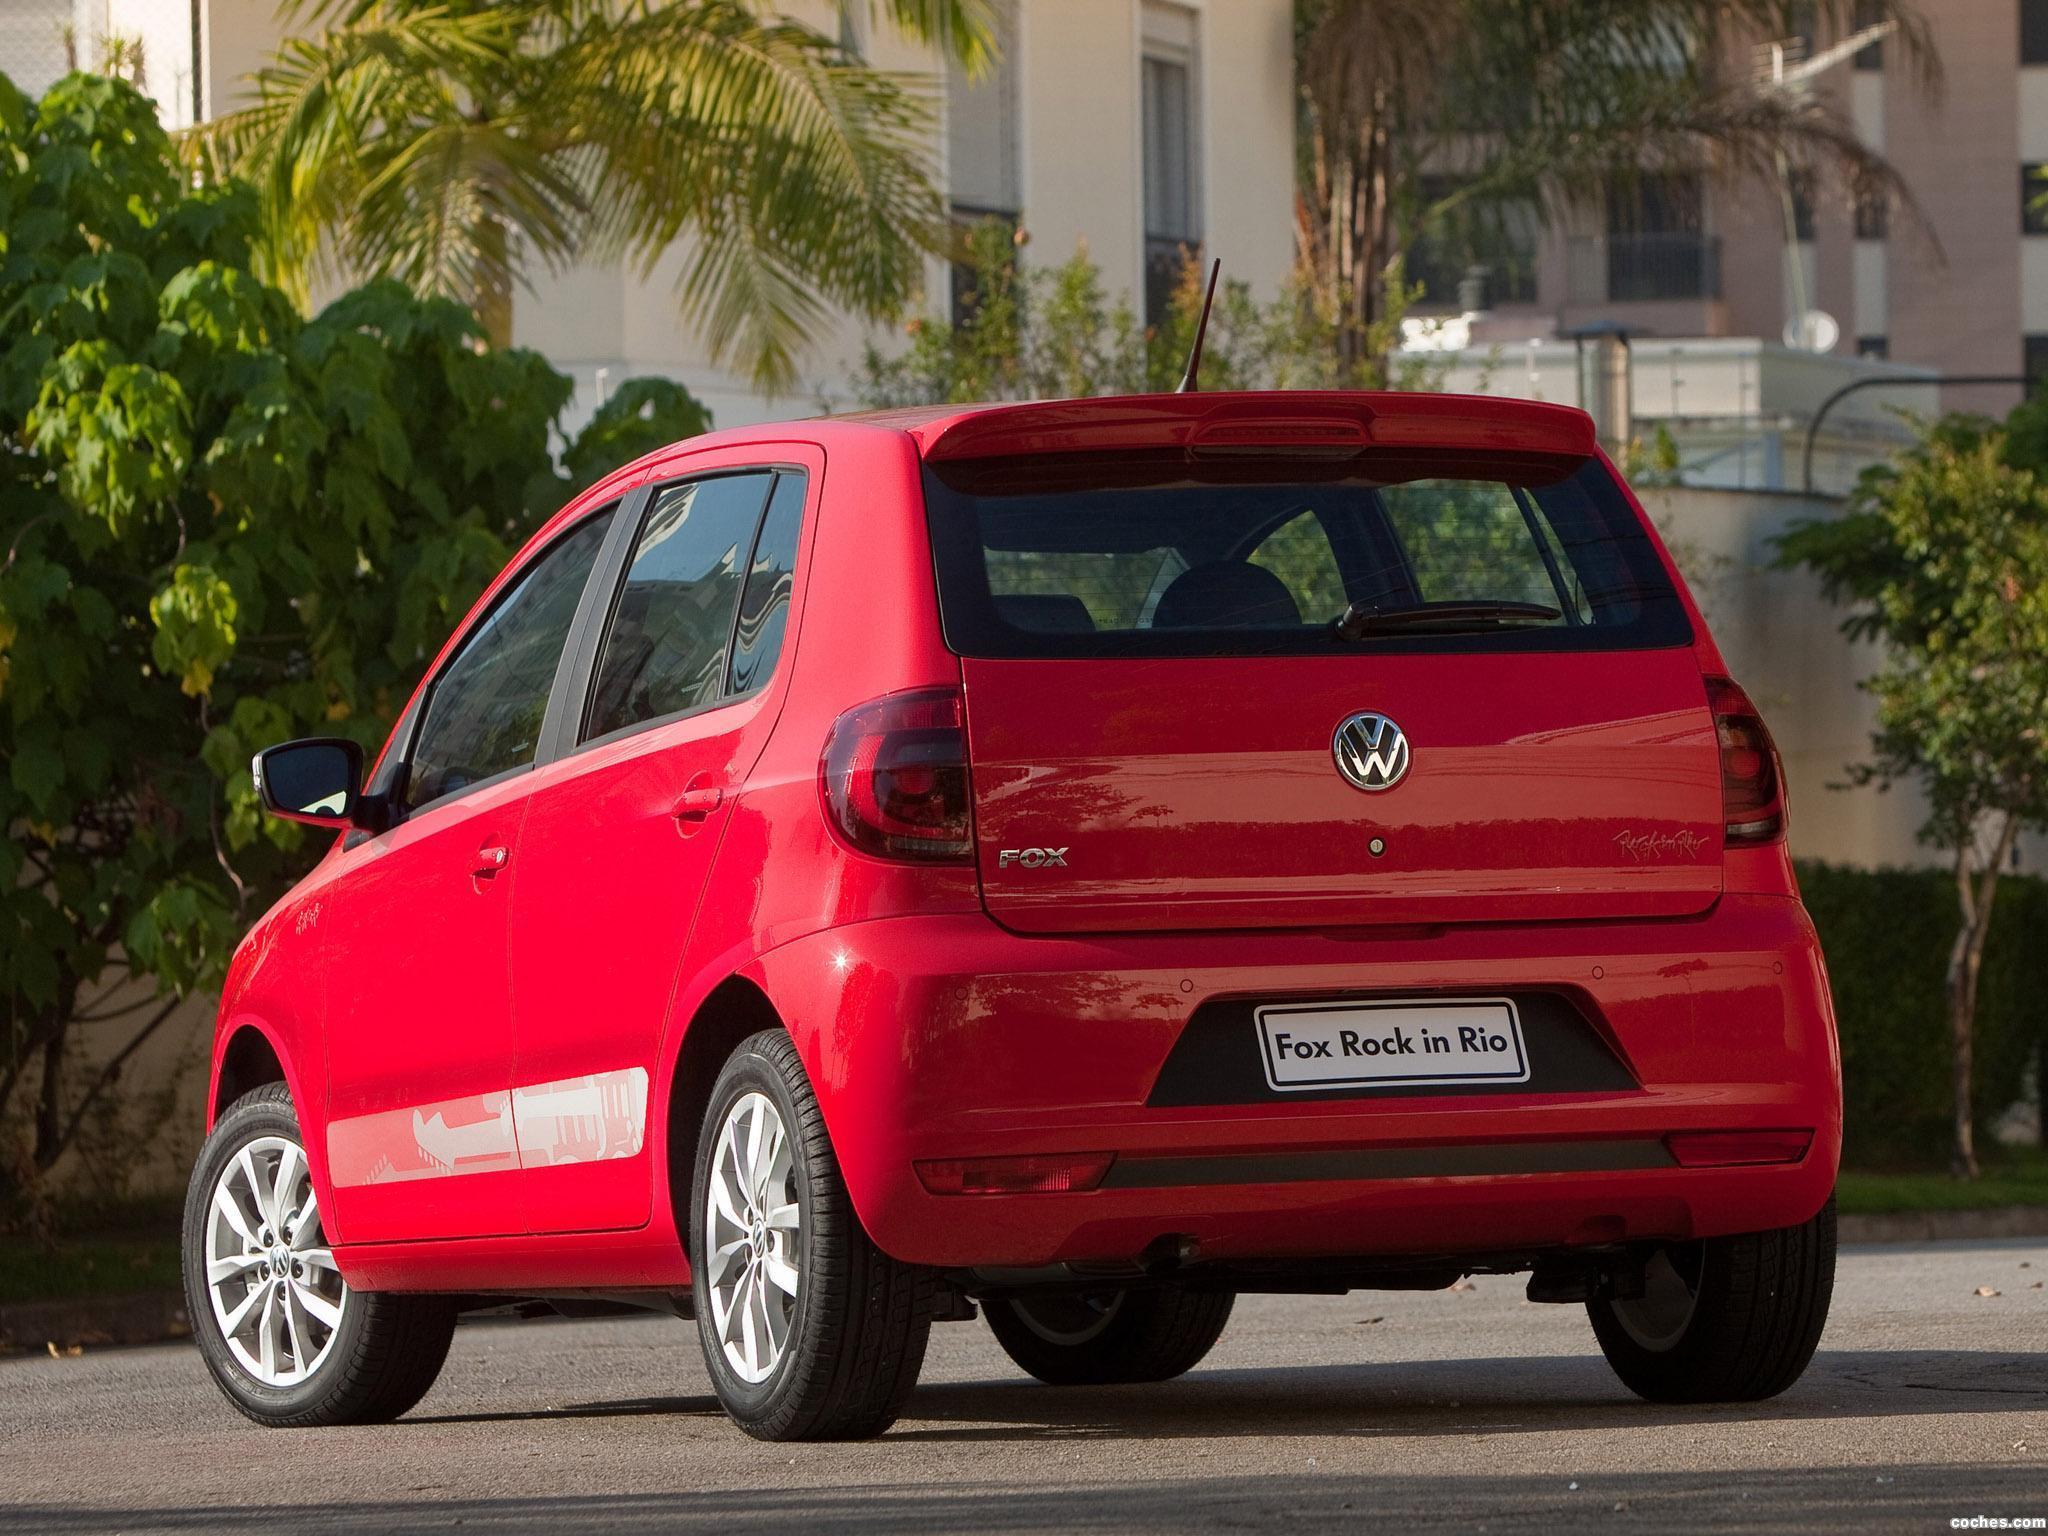 Foto 1 de Volkswagen Fox Rock in Rio 2013